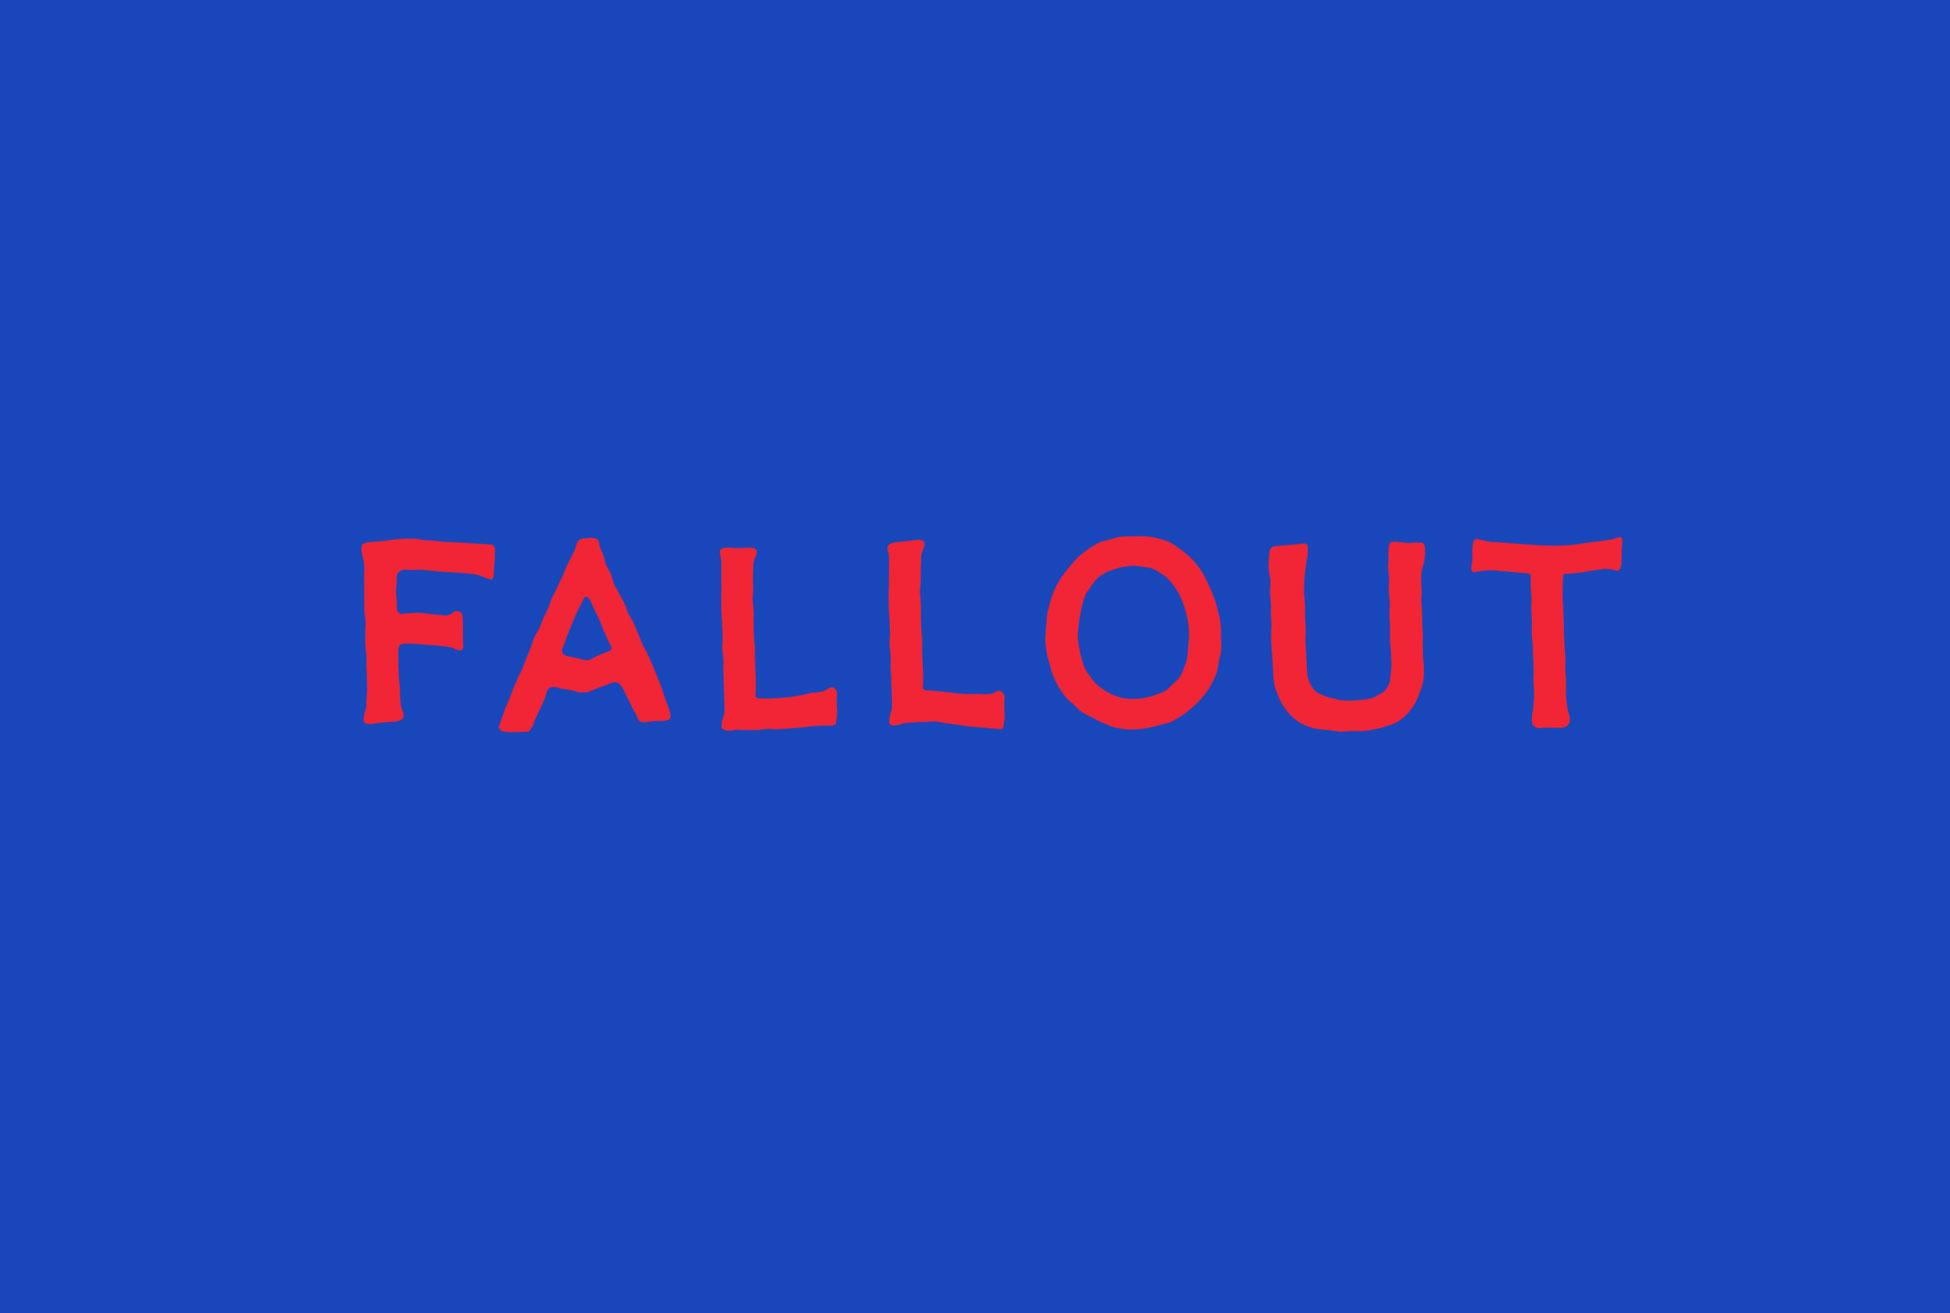 fallout_type-blue.jpg